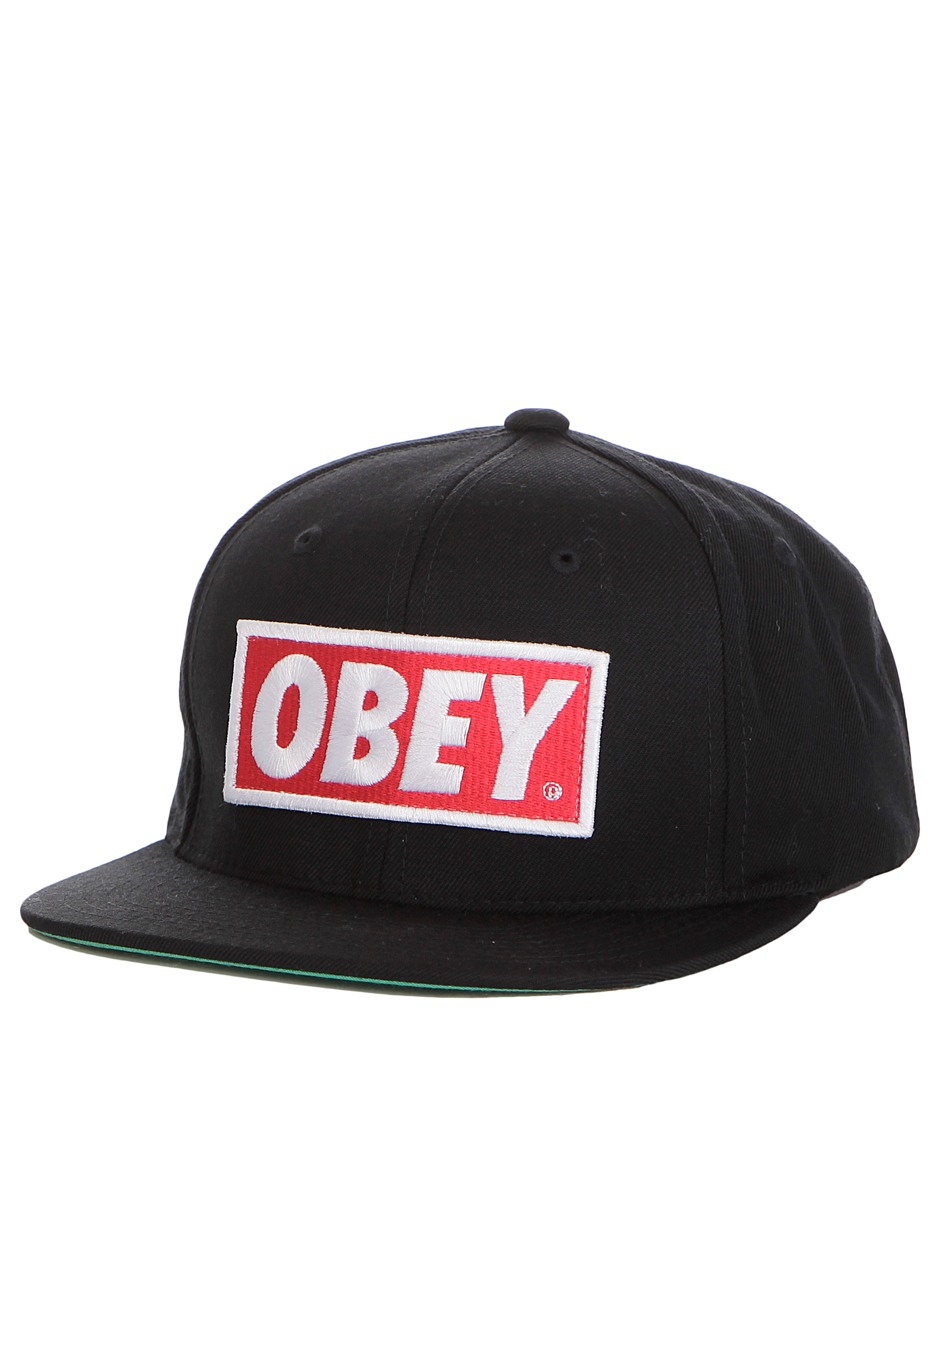 2b1bd3cd3ac42 Obey - Original Snapback - Cap - Streetwear Shop - Impericon.com UK